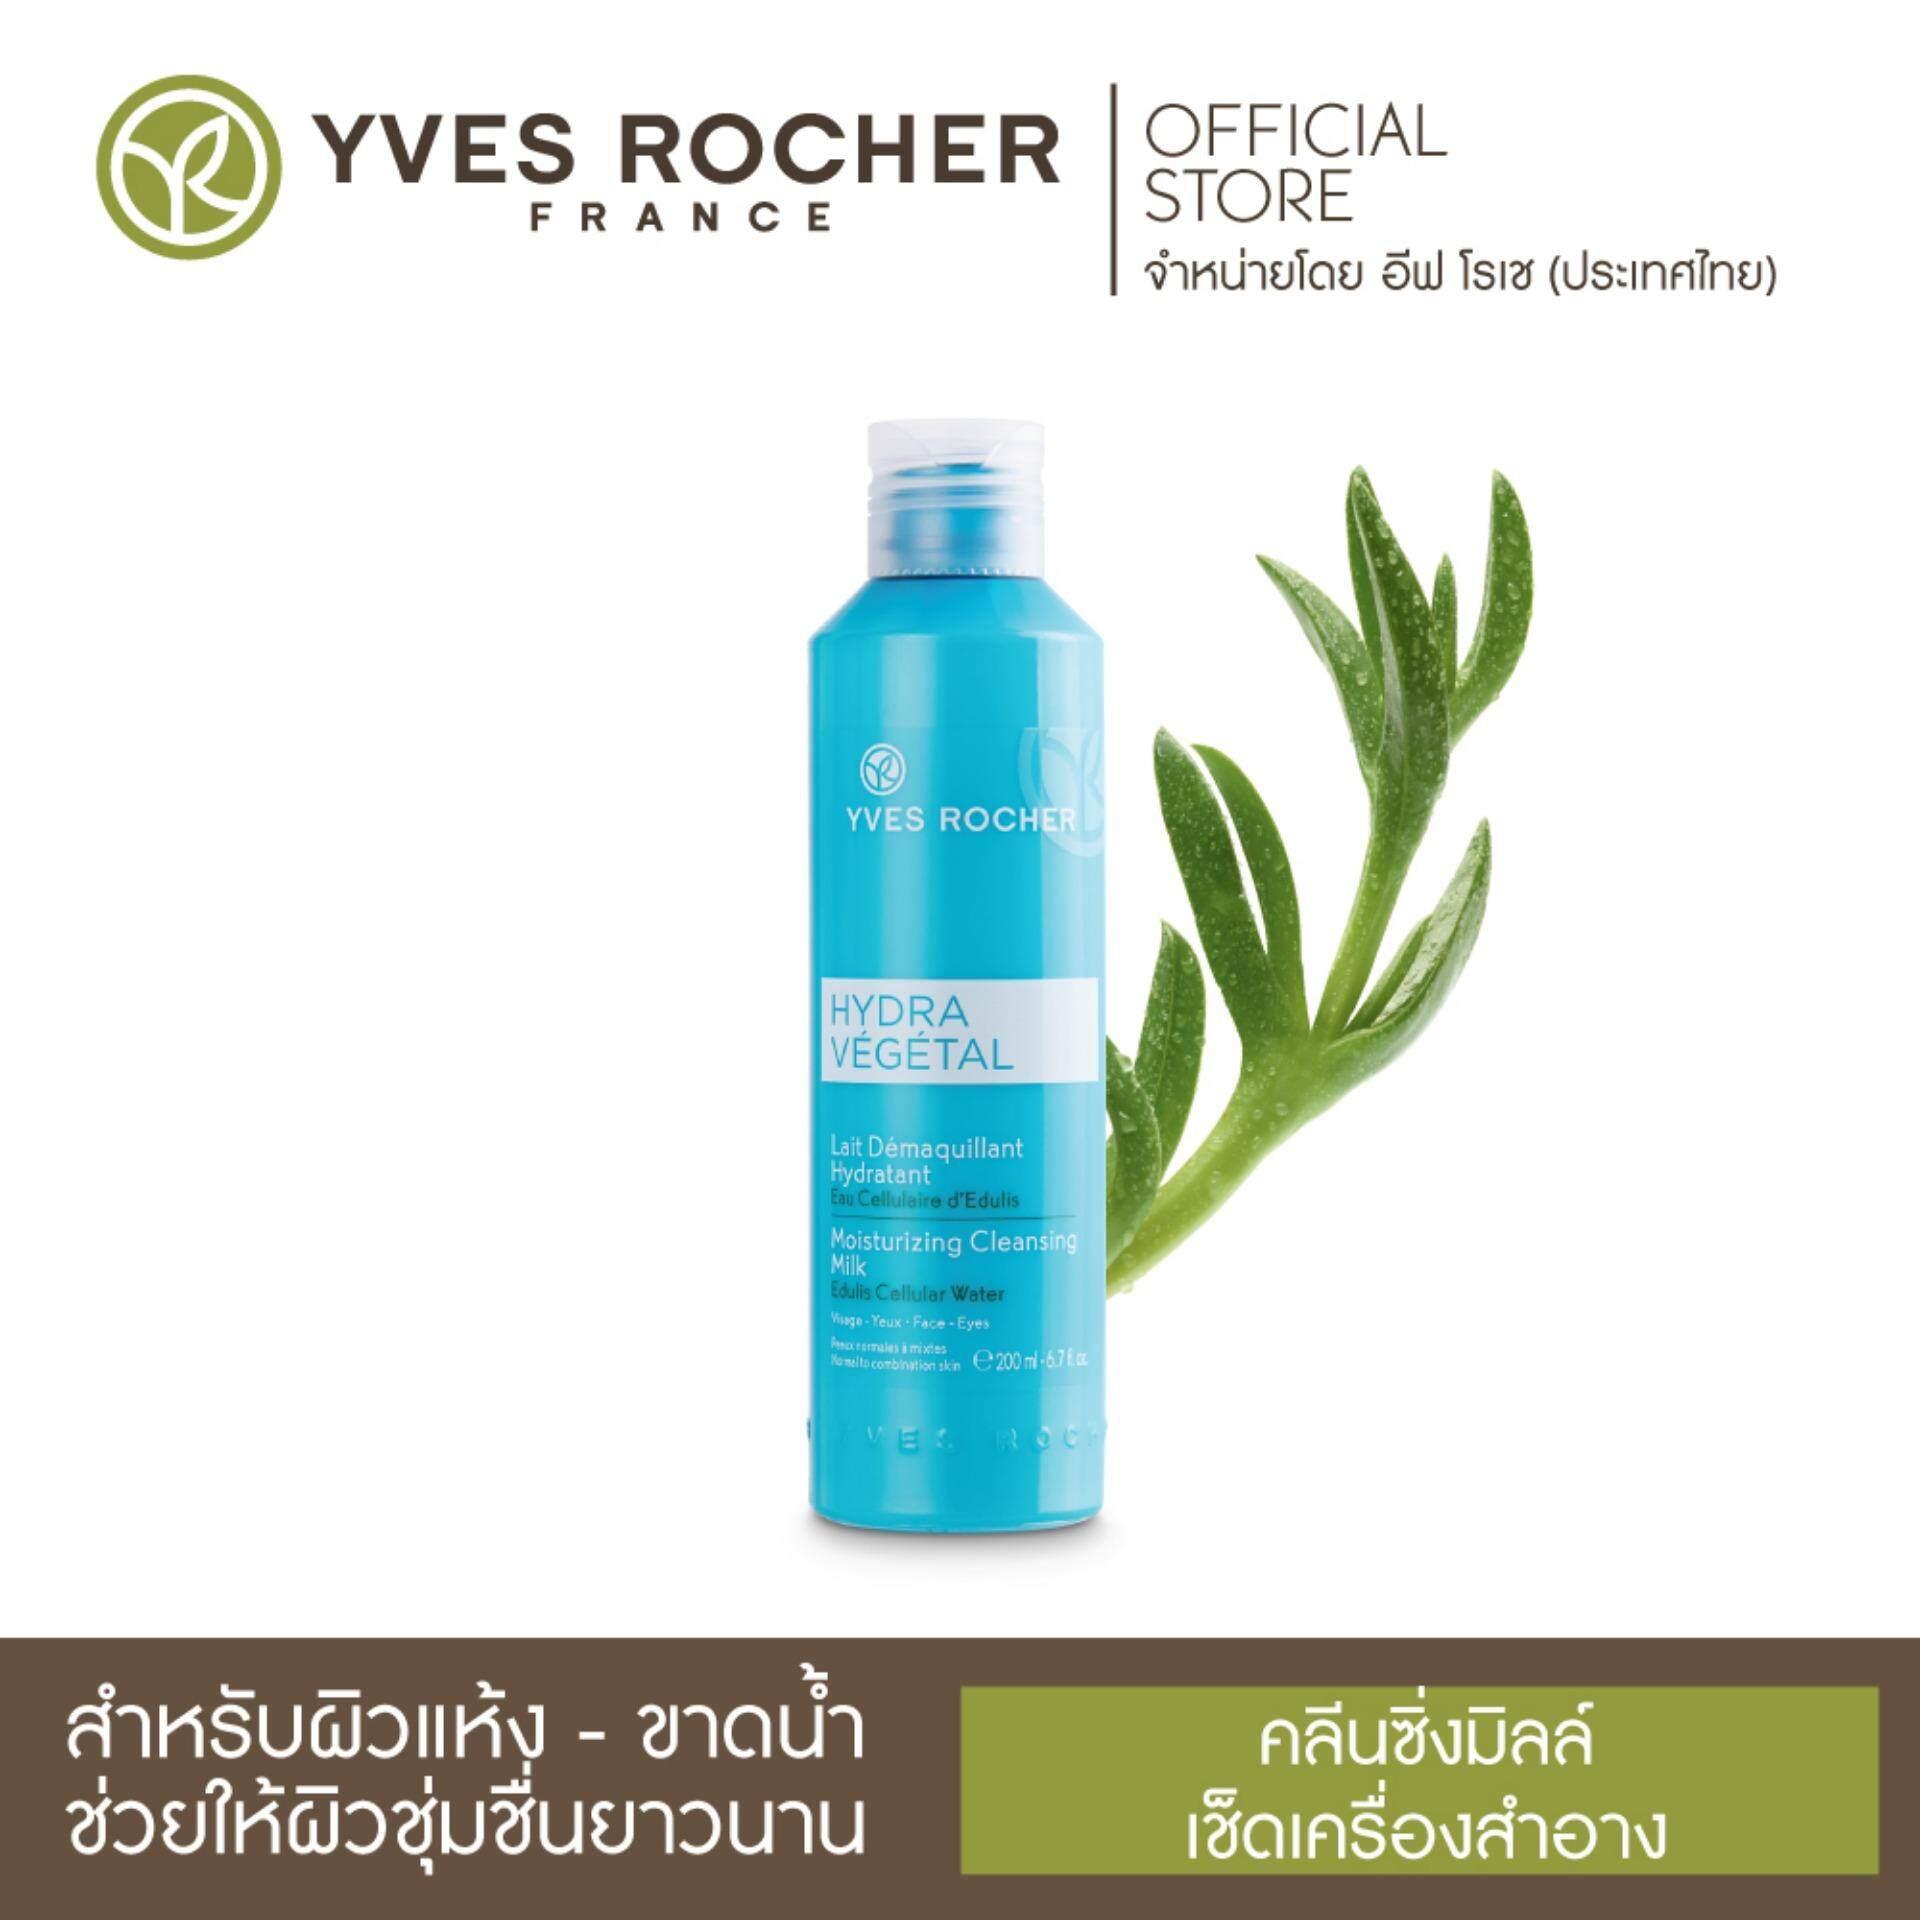 Yves Rocher Hydra Vegetal Moisturizing Cleansing Milk 200ml